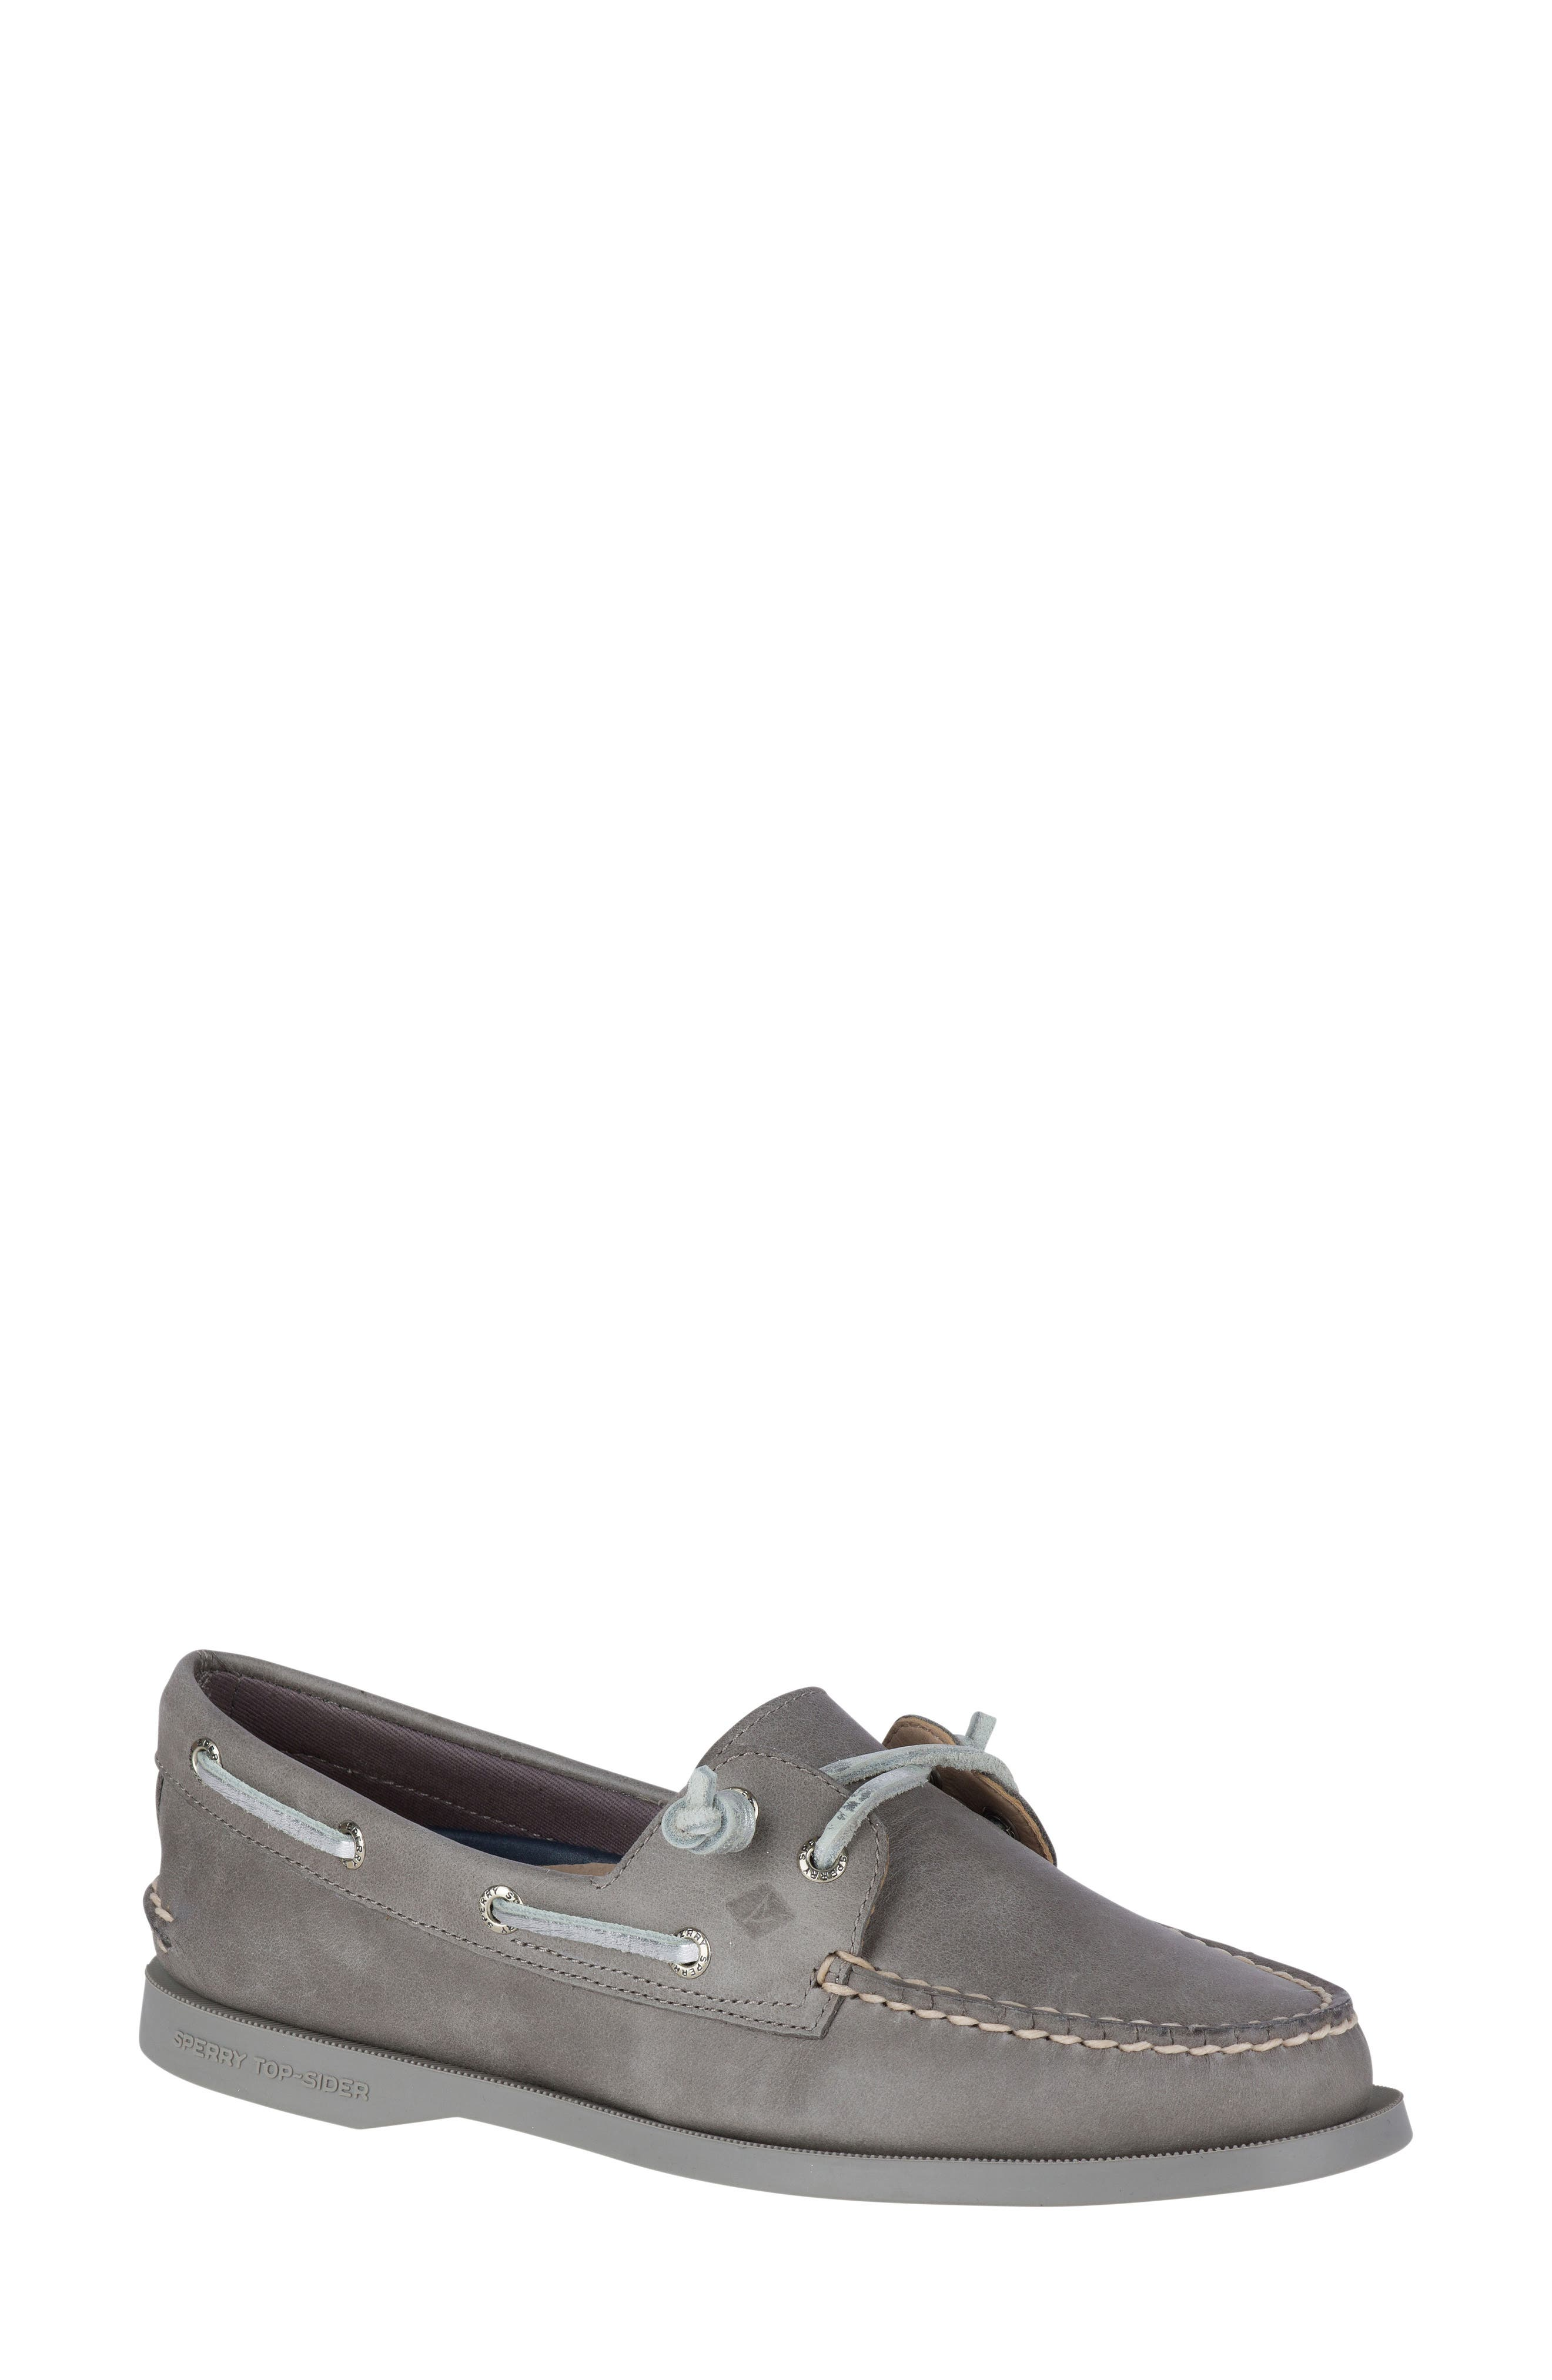 Vida Boat Shoe,                         Main,                         color,